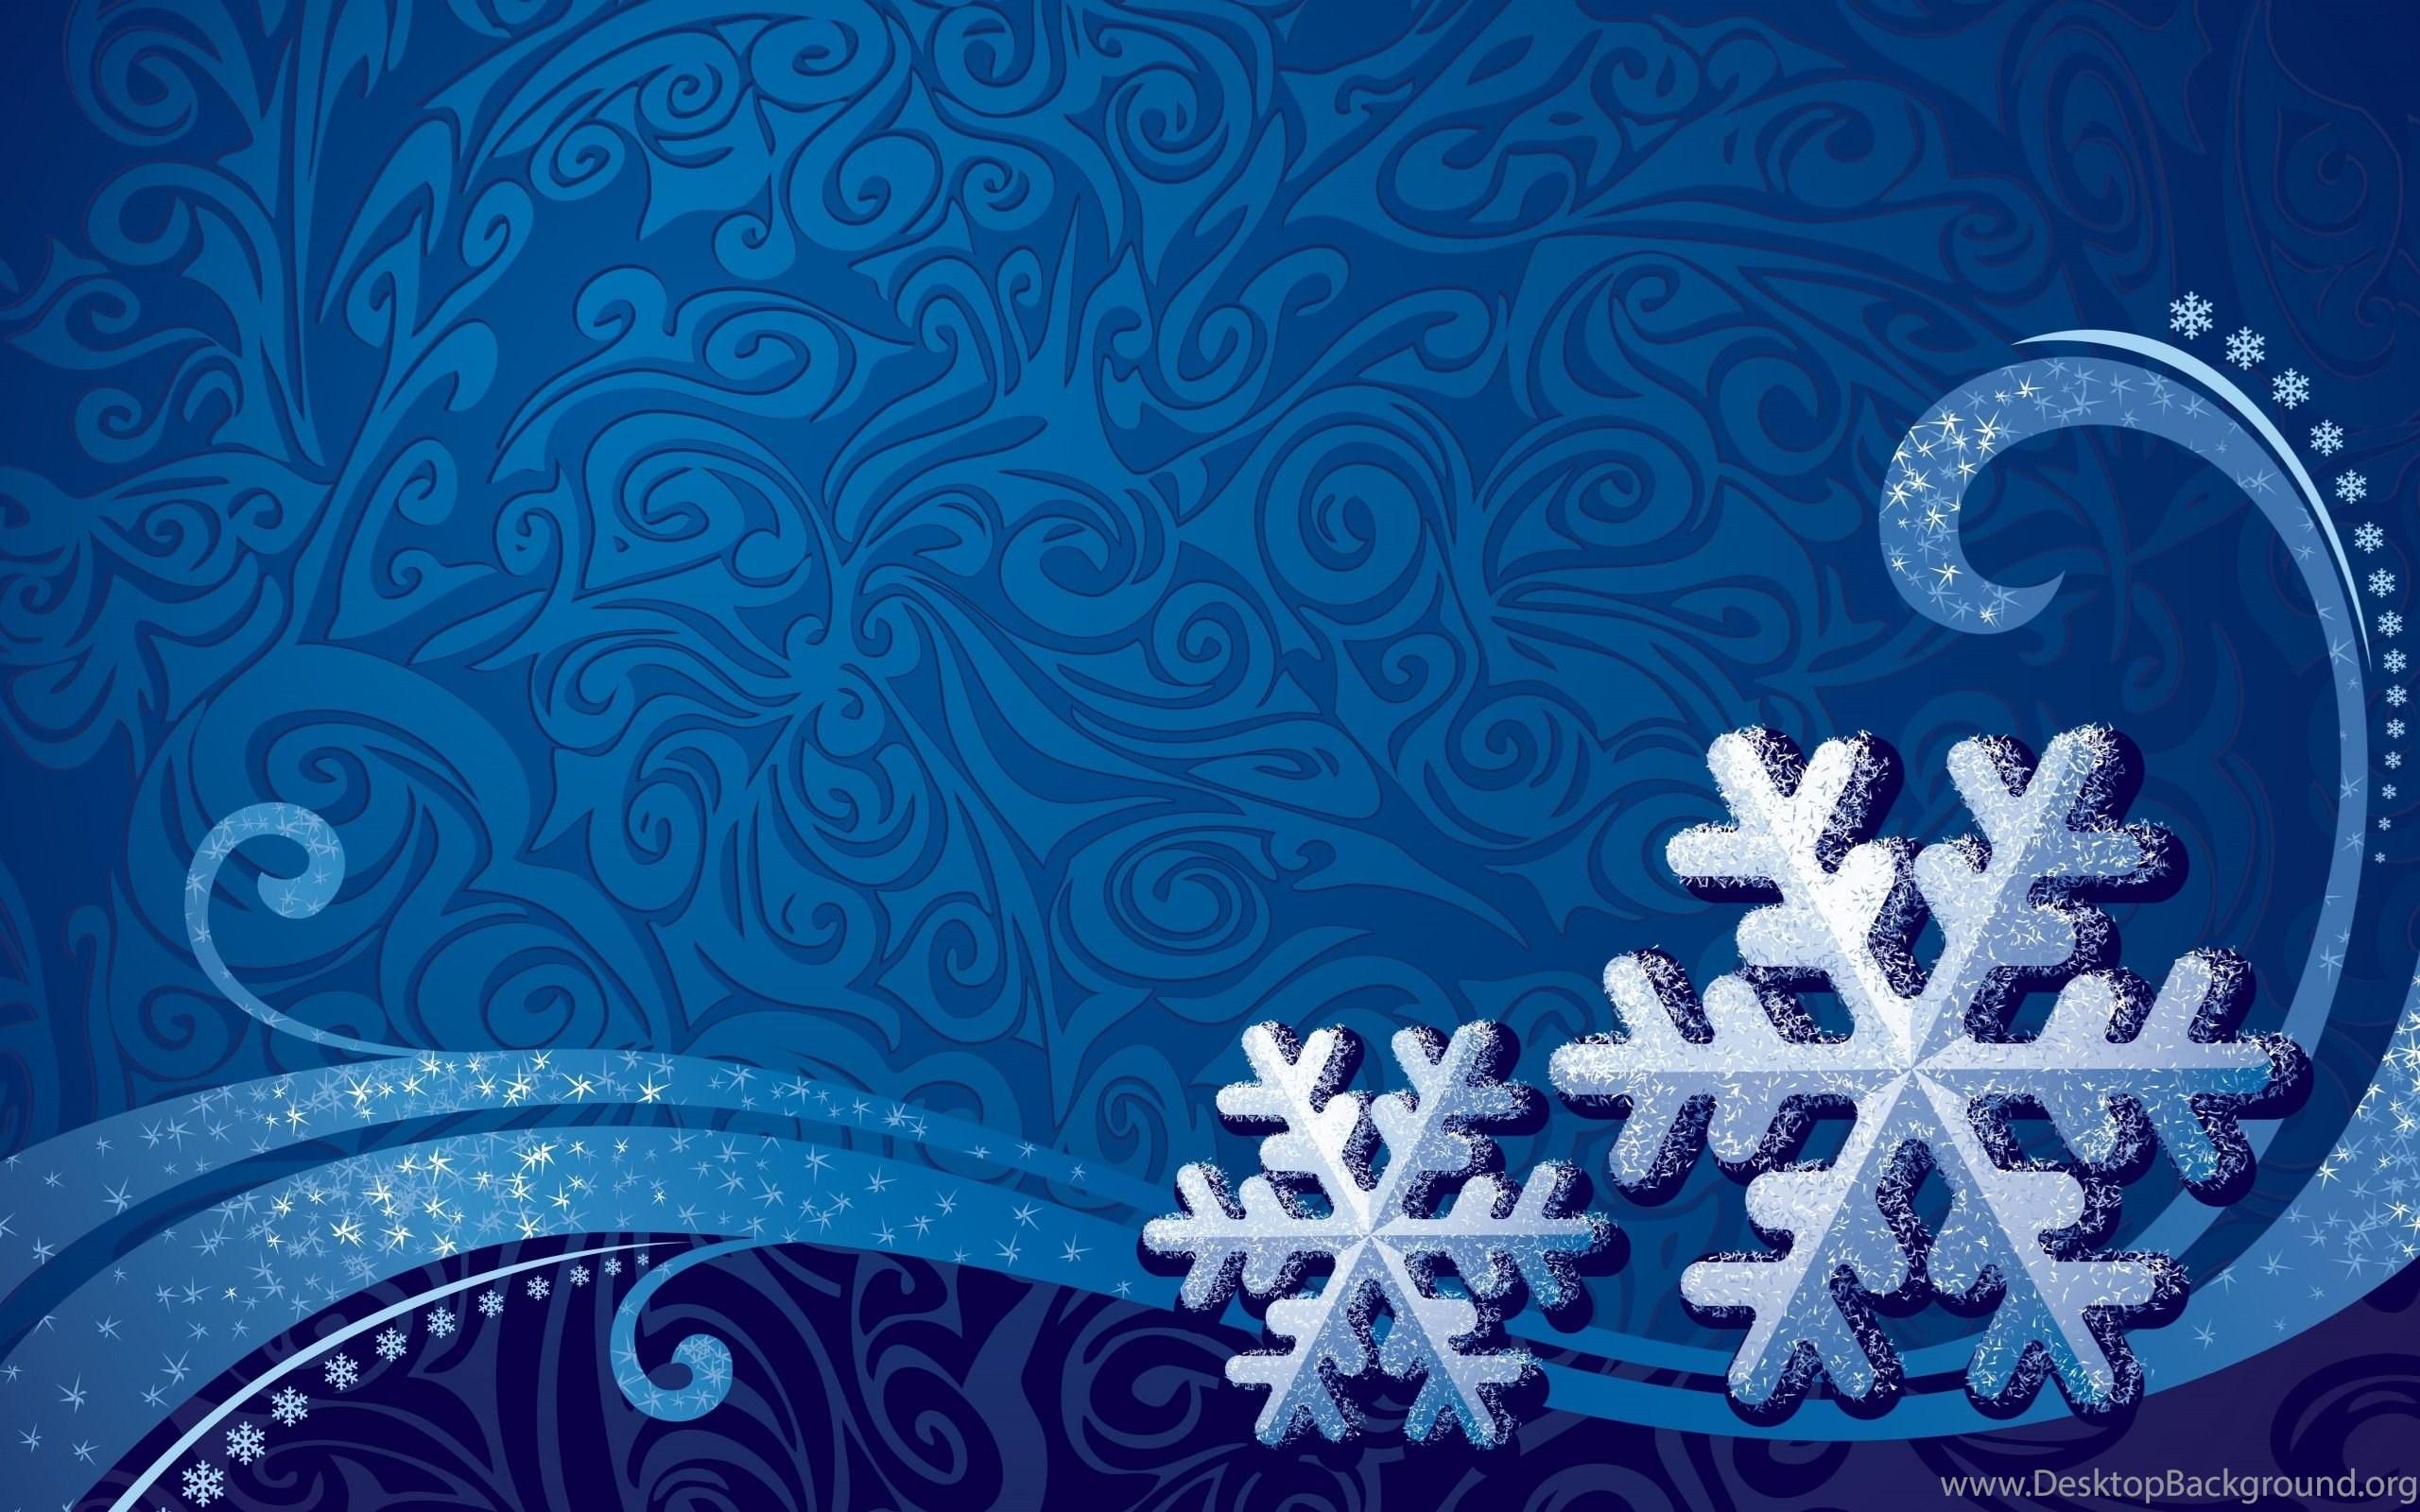 Snowflake Patterns Vector Art Blue Backgrounds Wallpapers HD Desktop